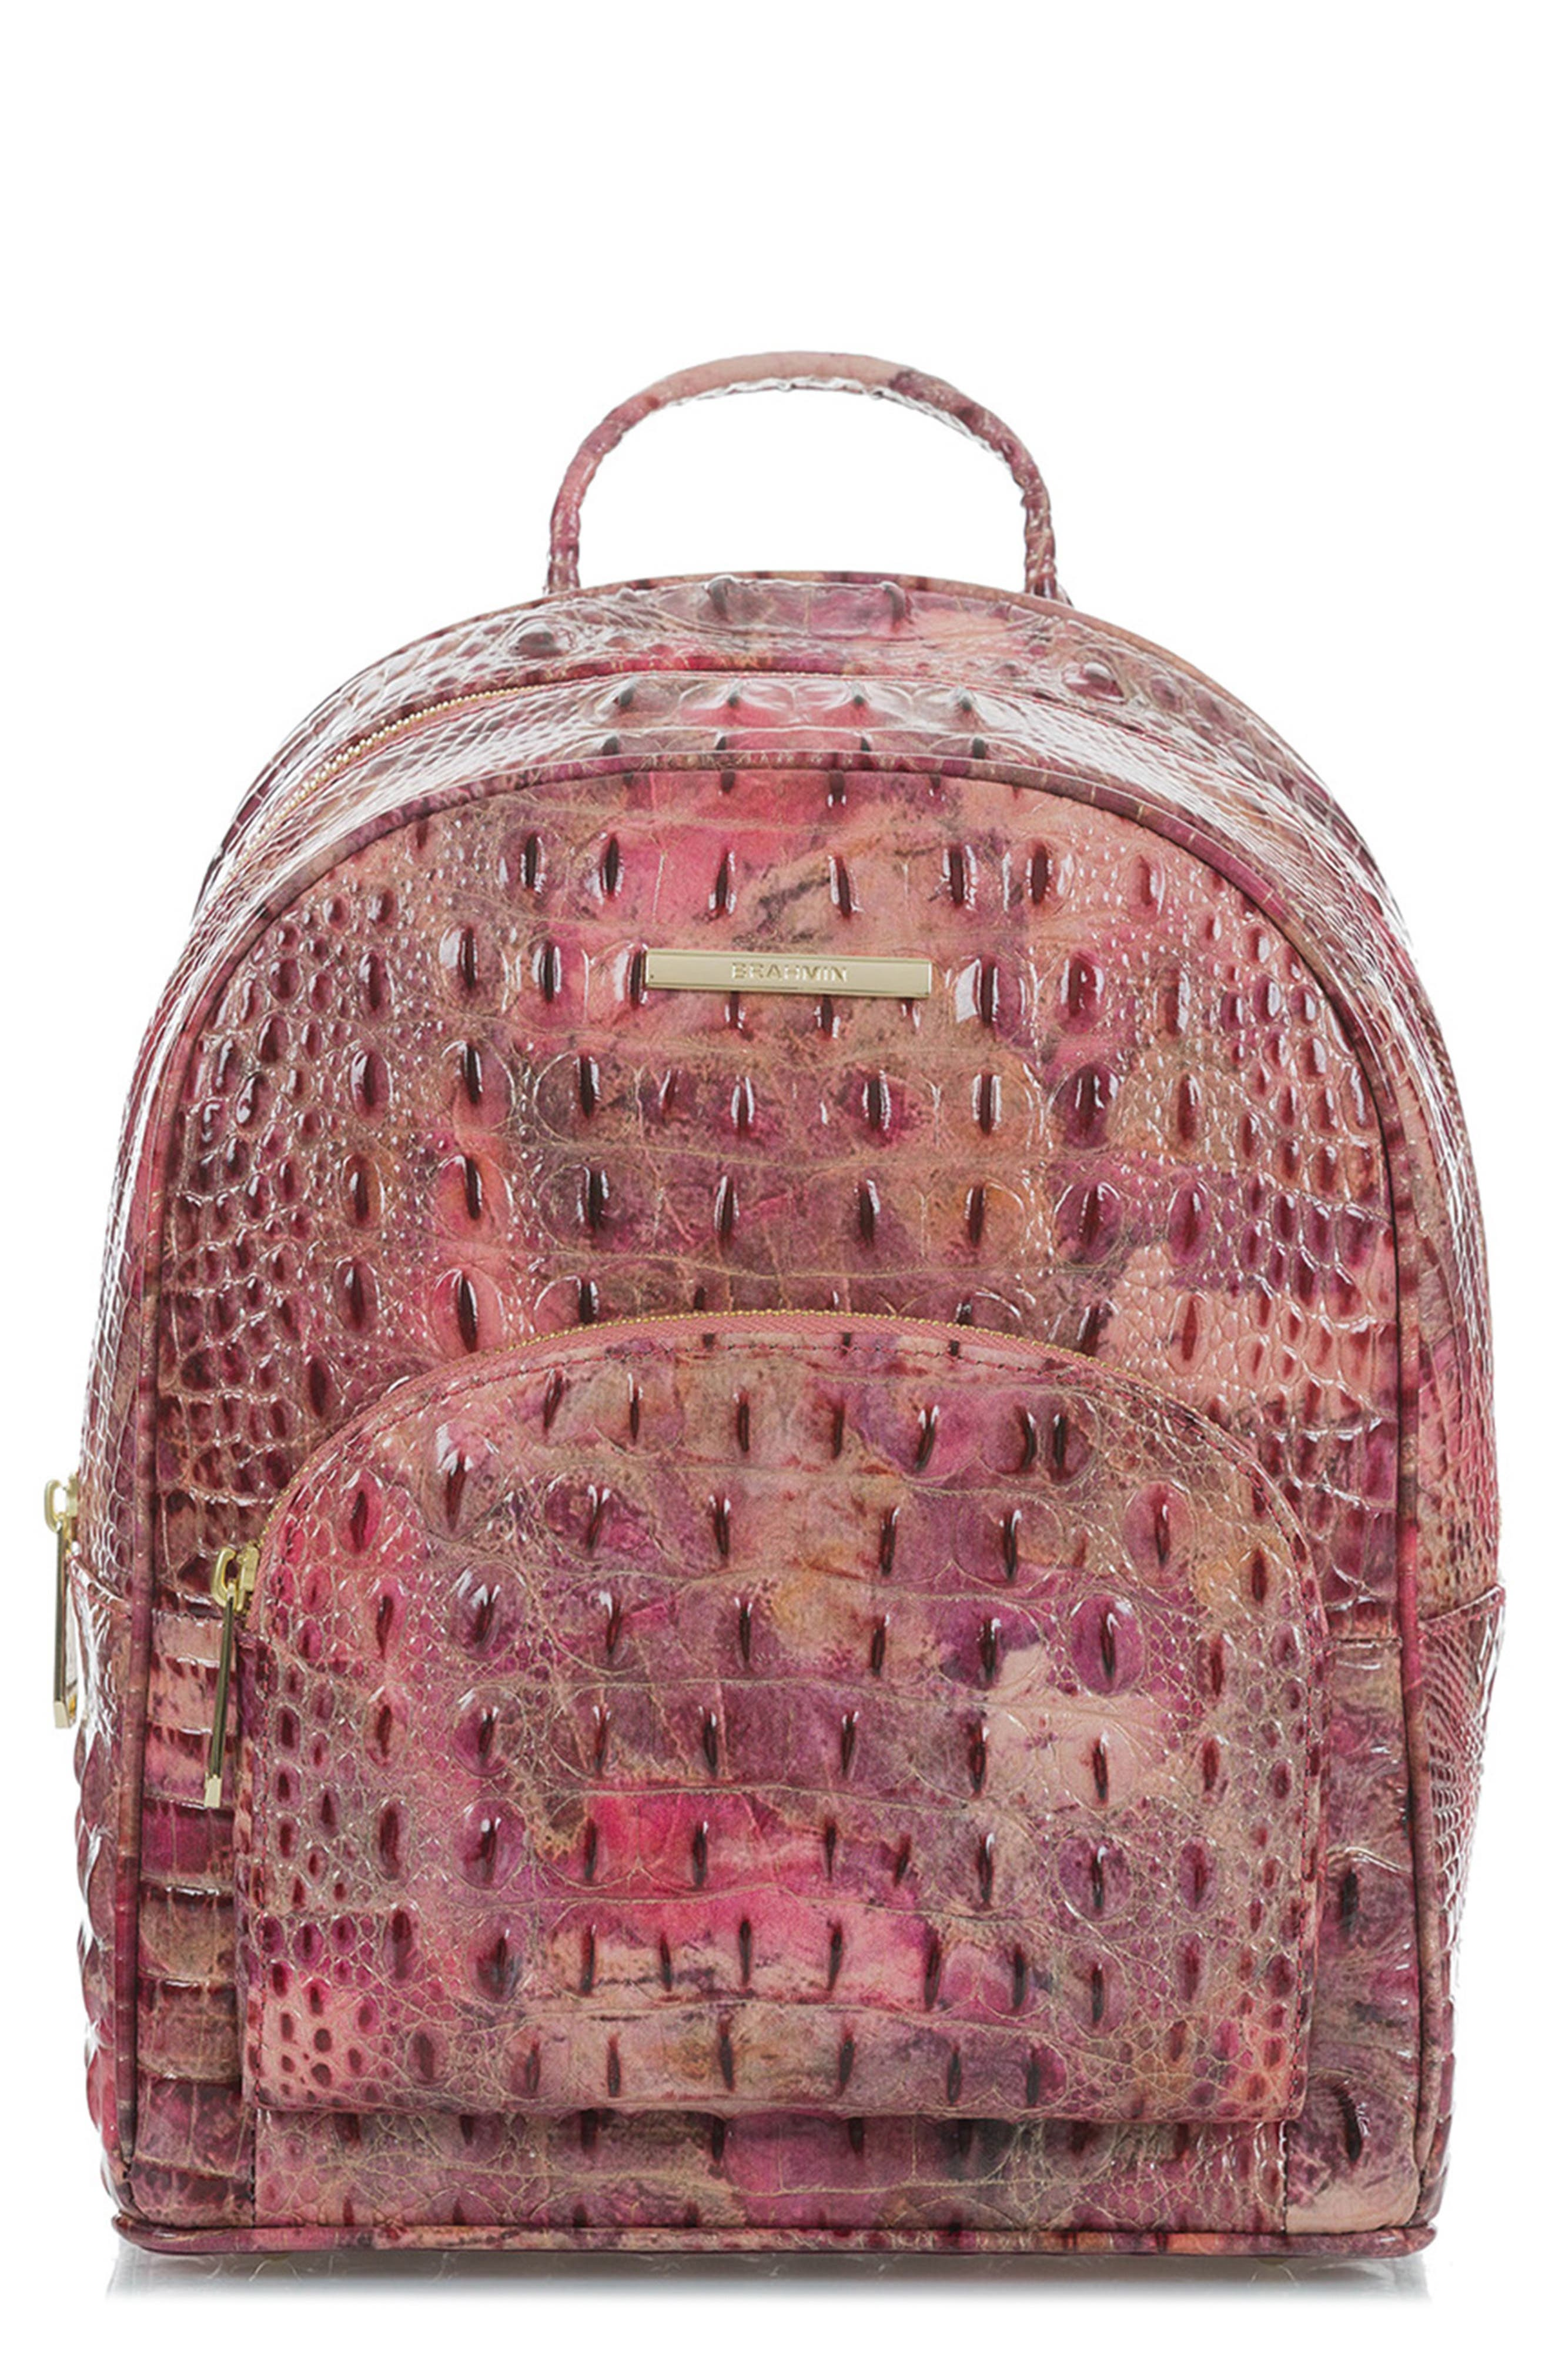 Mini Dartmouth Leather Backpack,                             Main thumbnail 1, color,                             WISTERIA